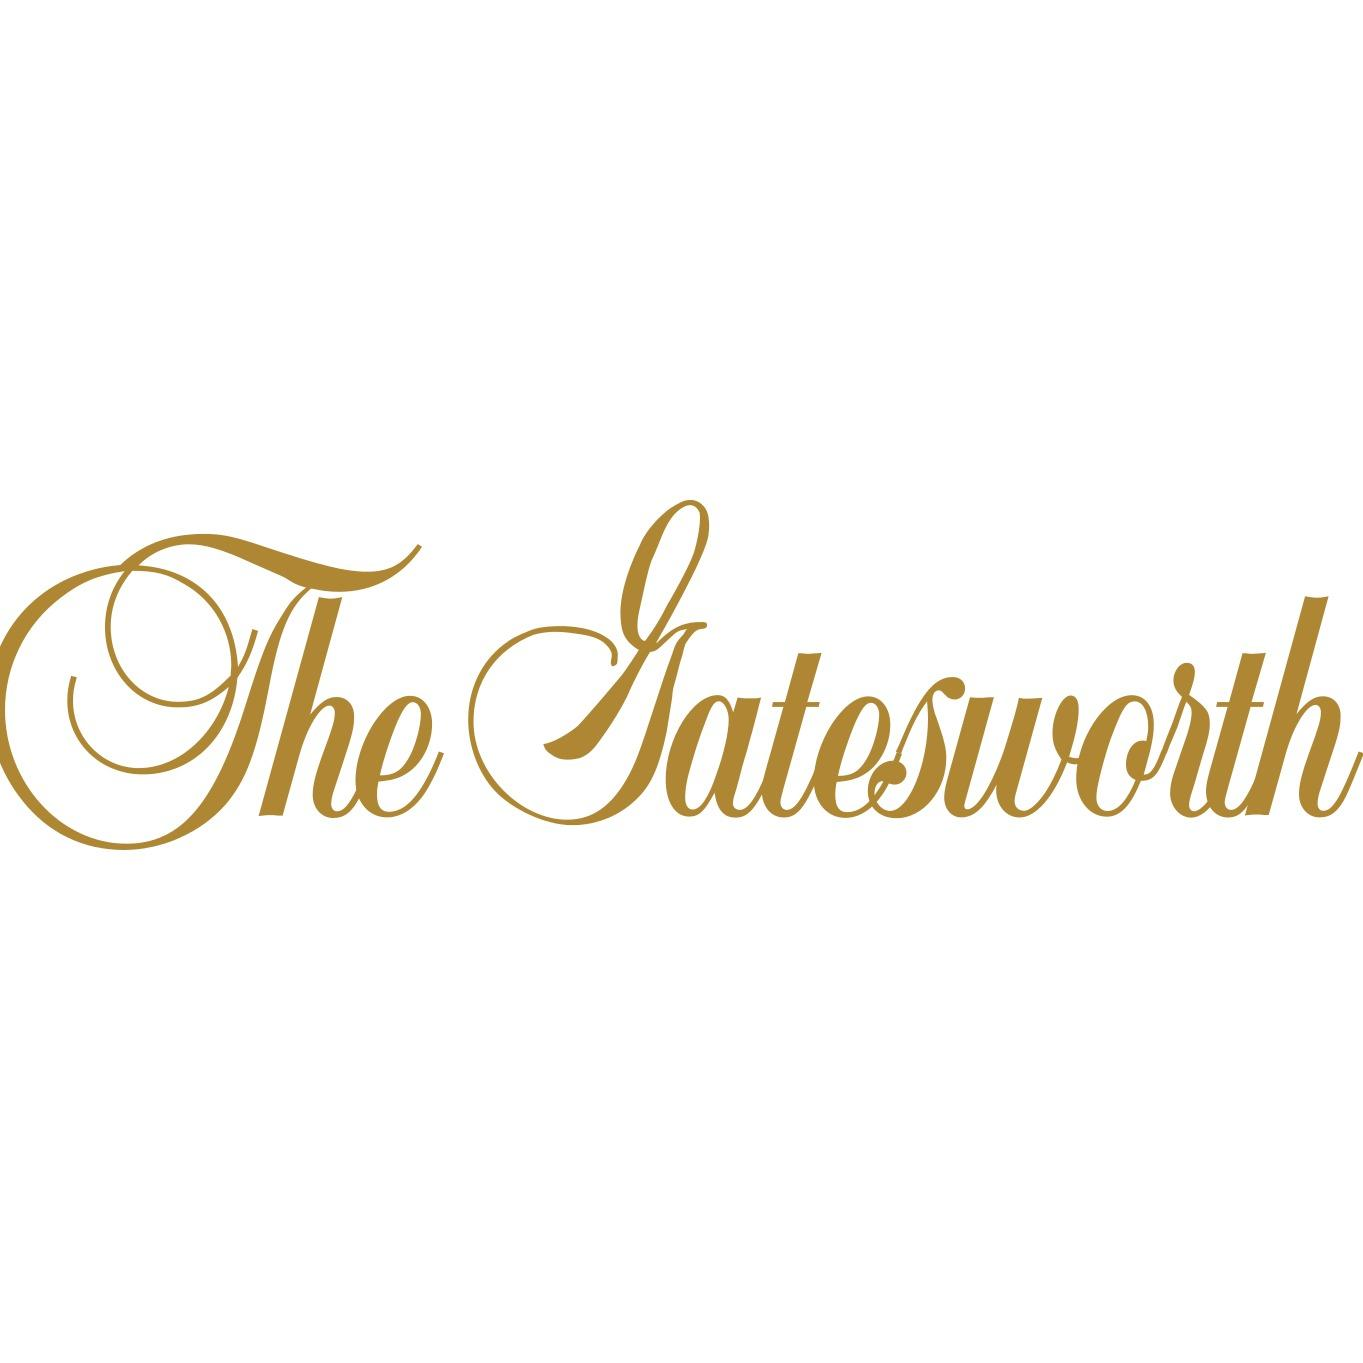 The Gatesworth